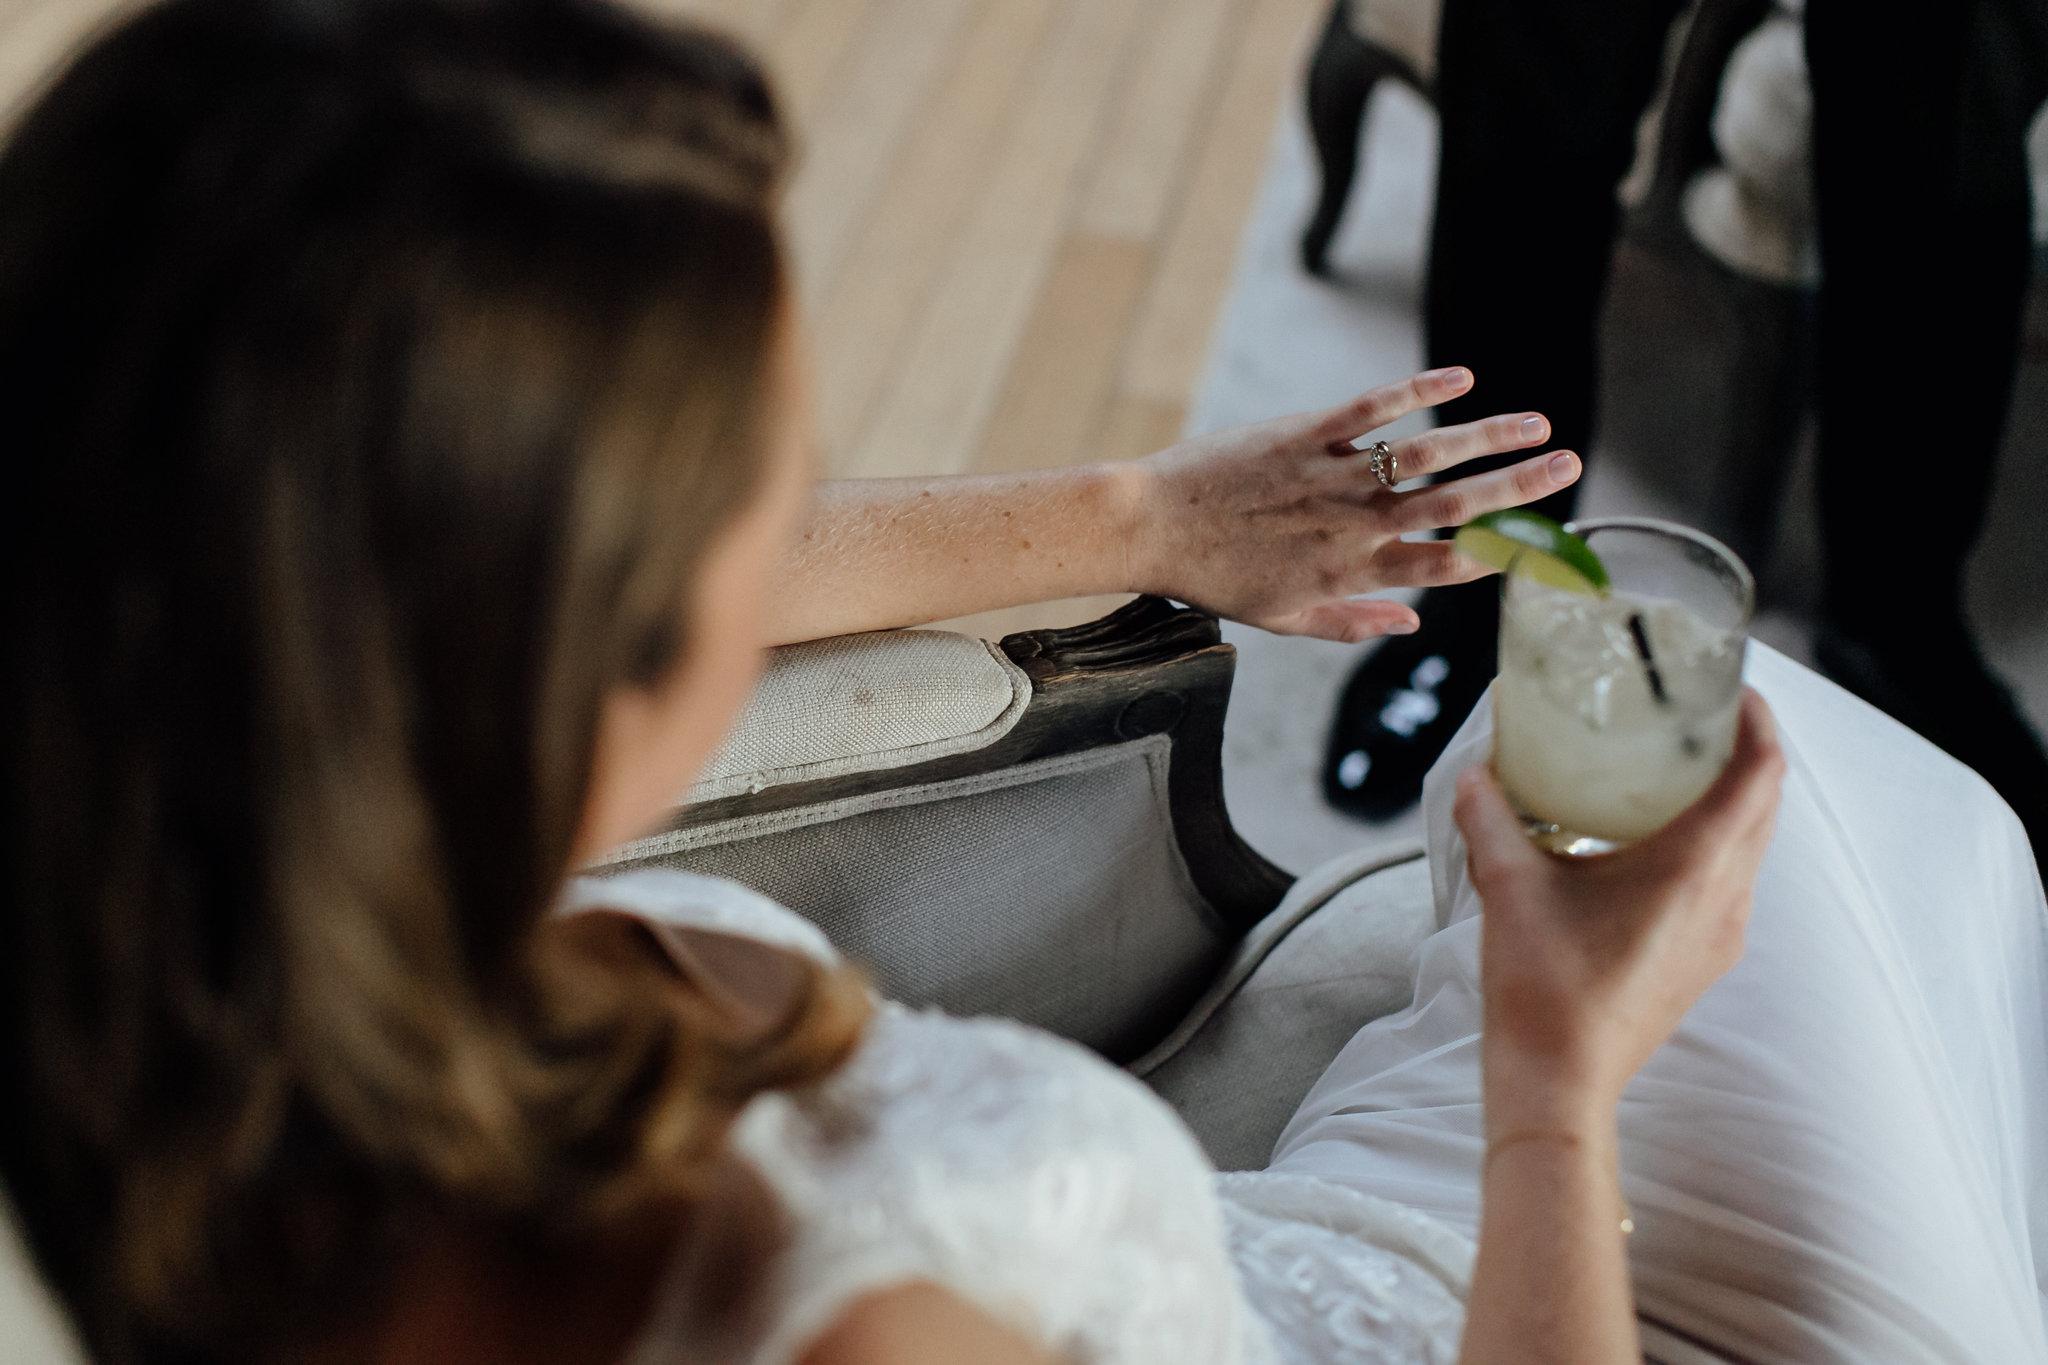 carondelet-los-angeles-wedding-marble-rye-photography-ceremony-202.jpg